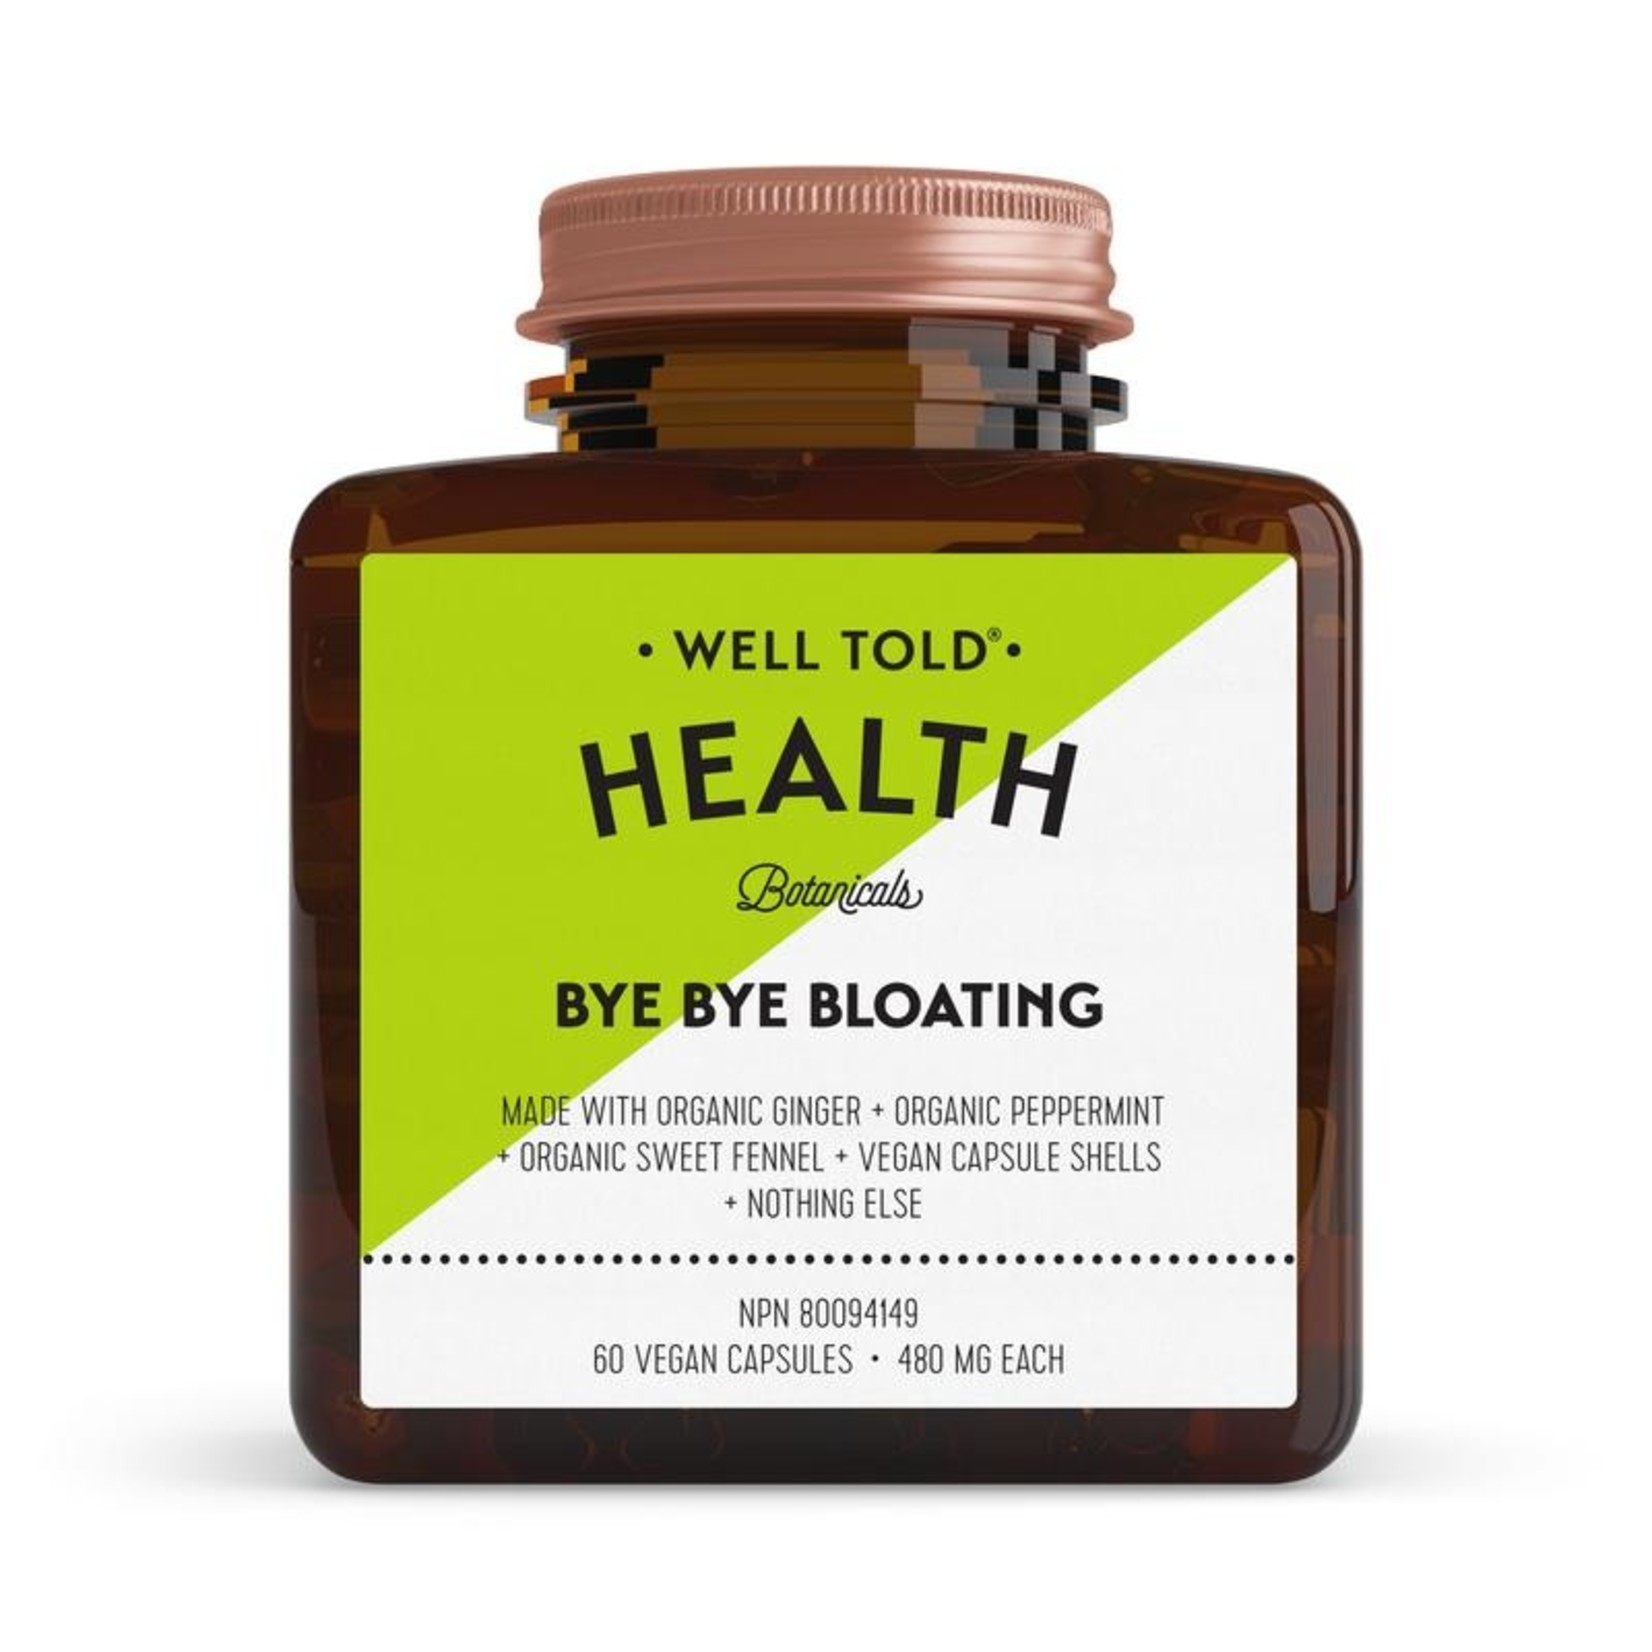 Well Told Health Bye Bye Bloating 60 caps